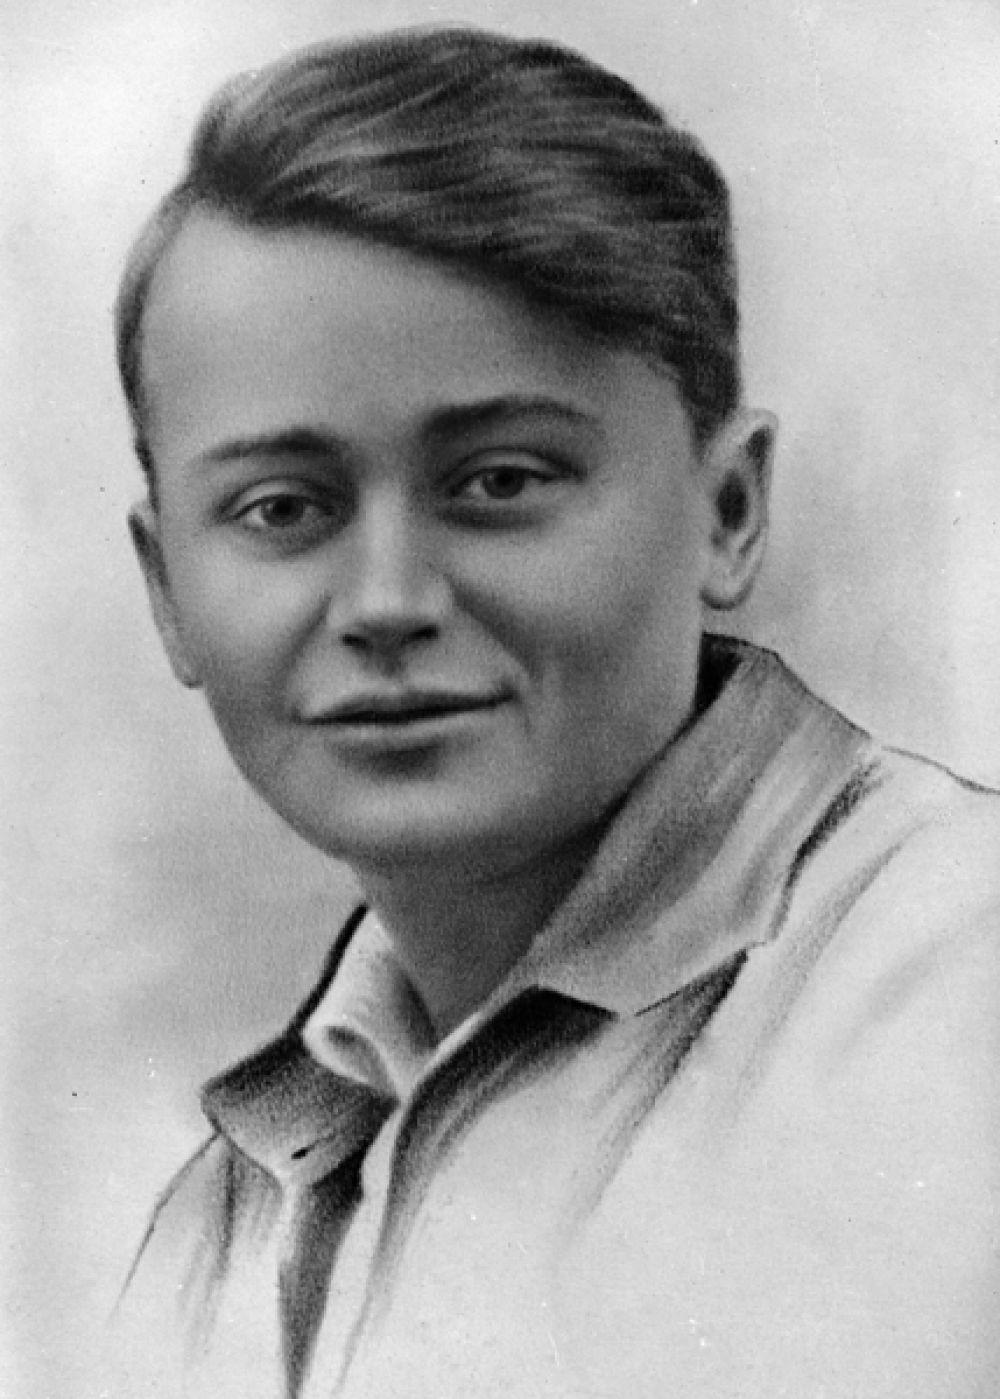 Комиссар «Молодой гвардии» Олег Кошевой.